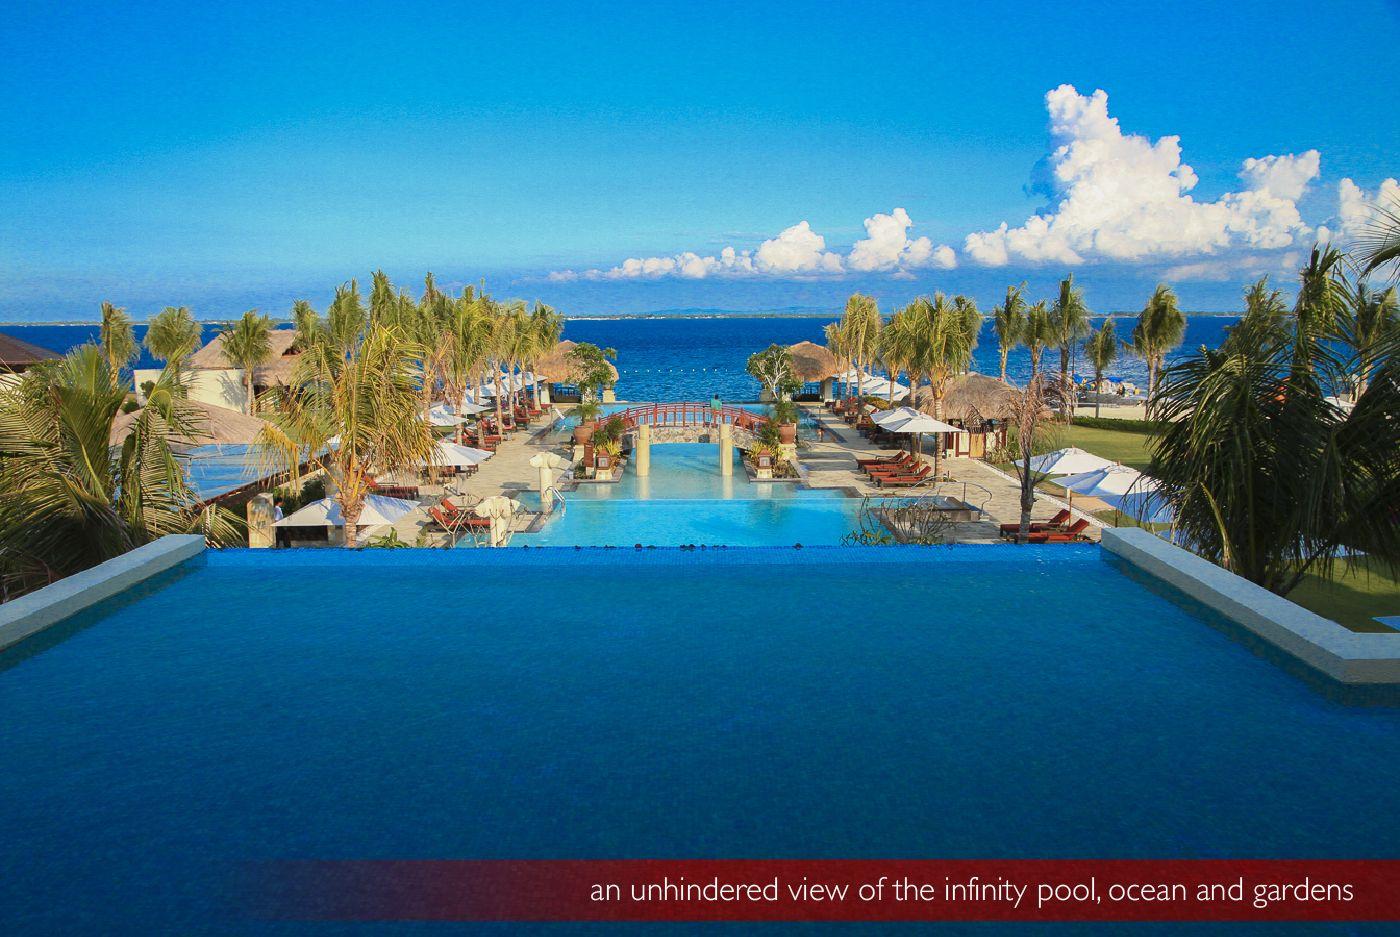 Climson hotel Cebu I went honeymoon #2